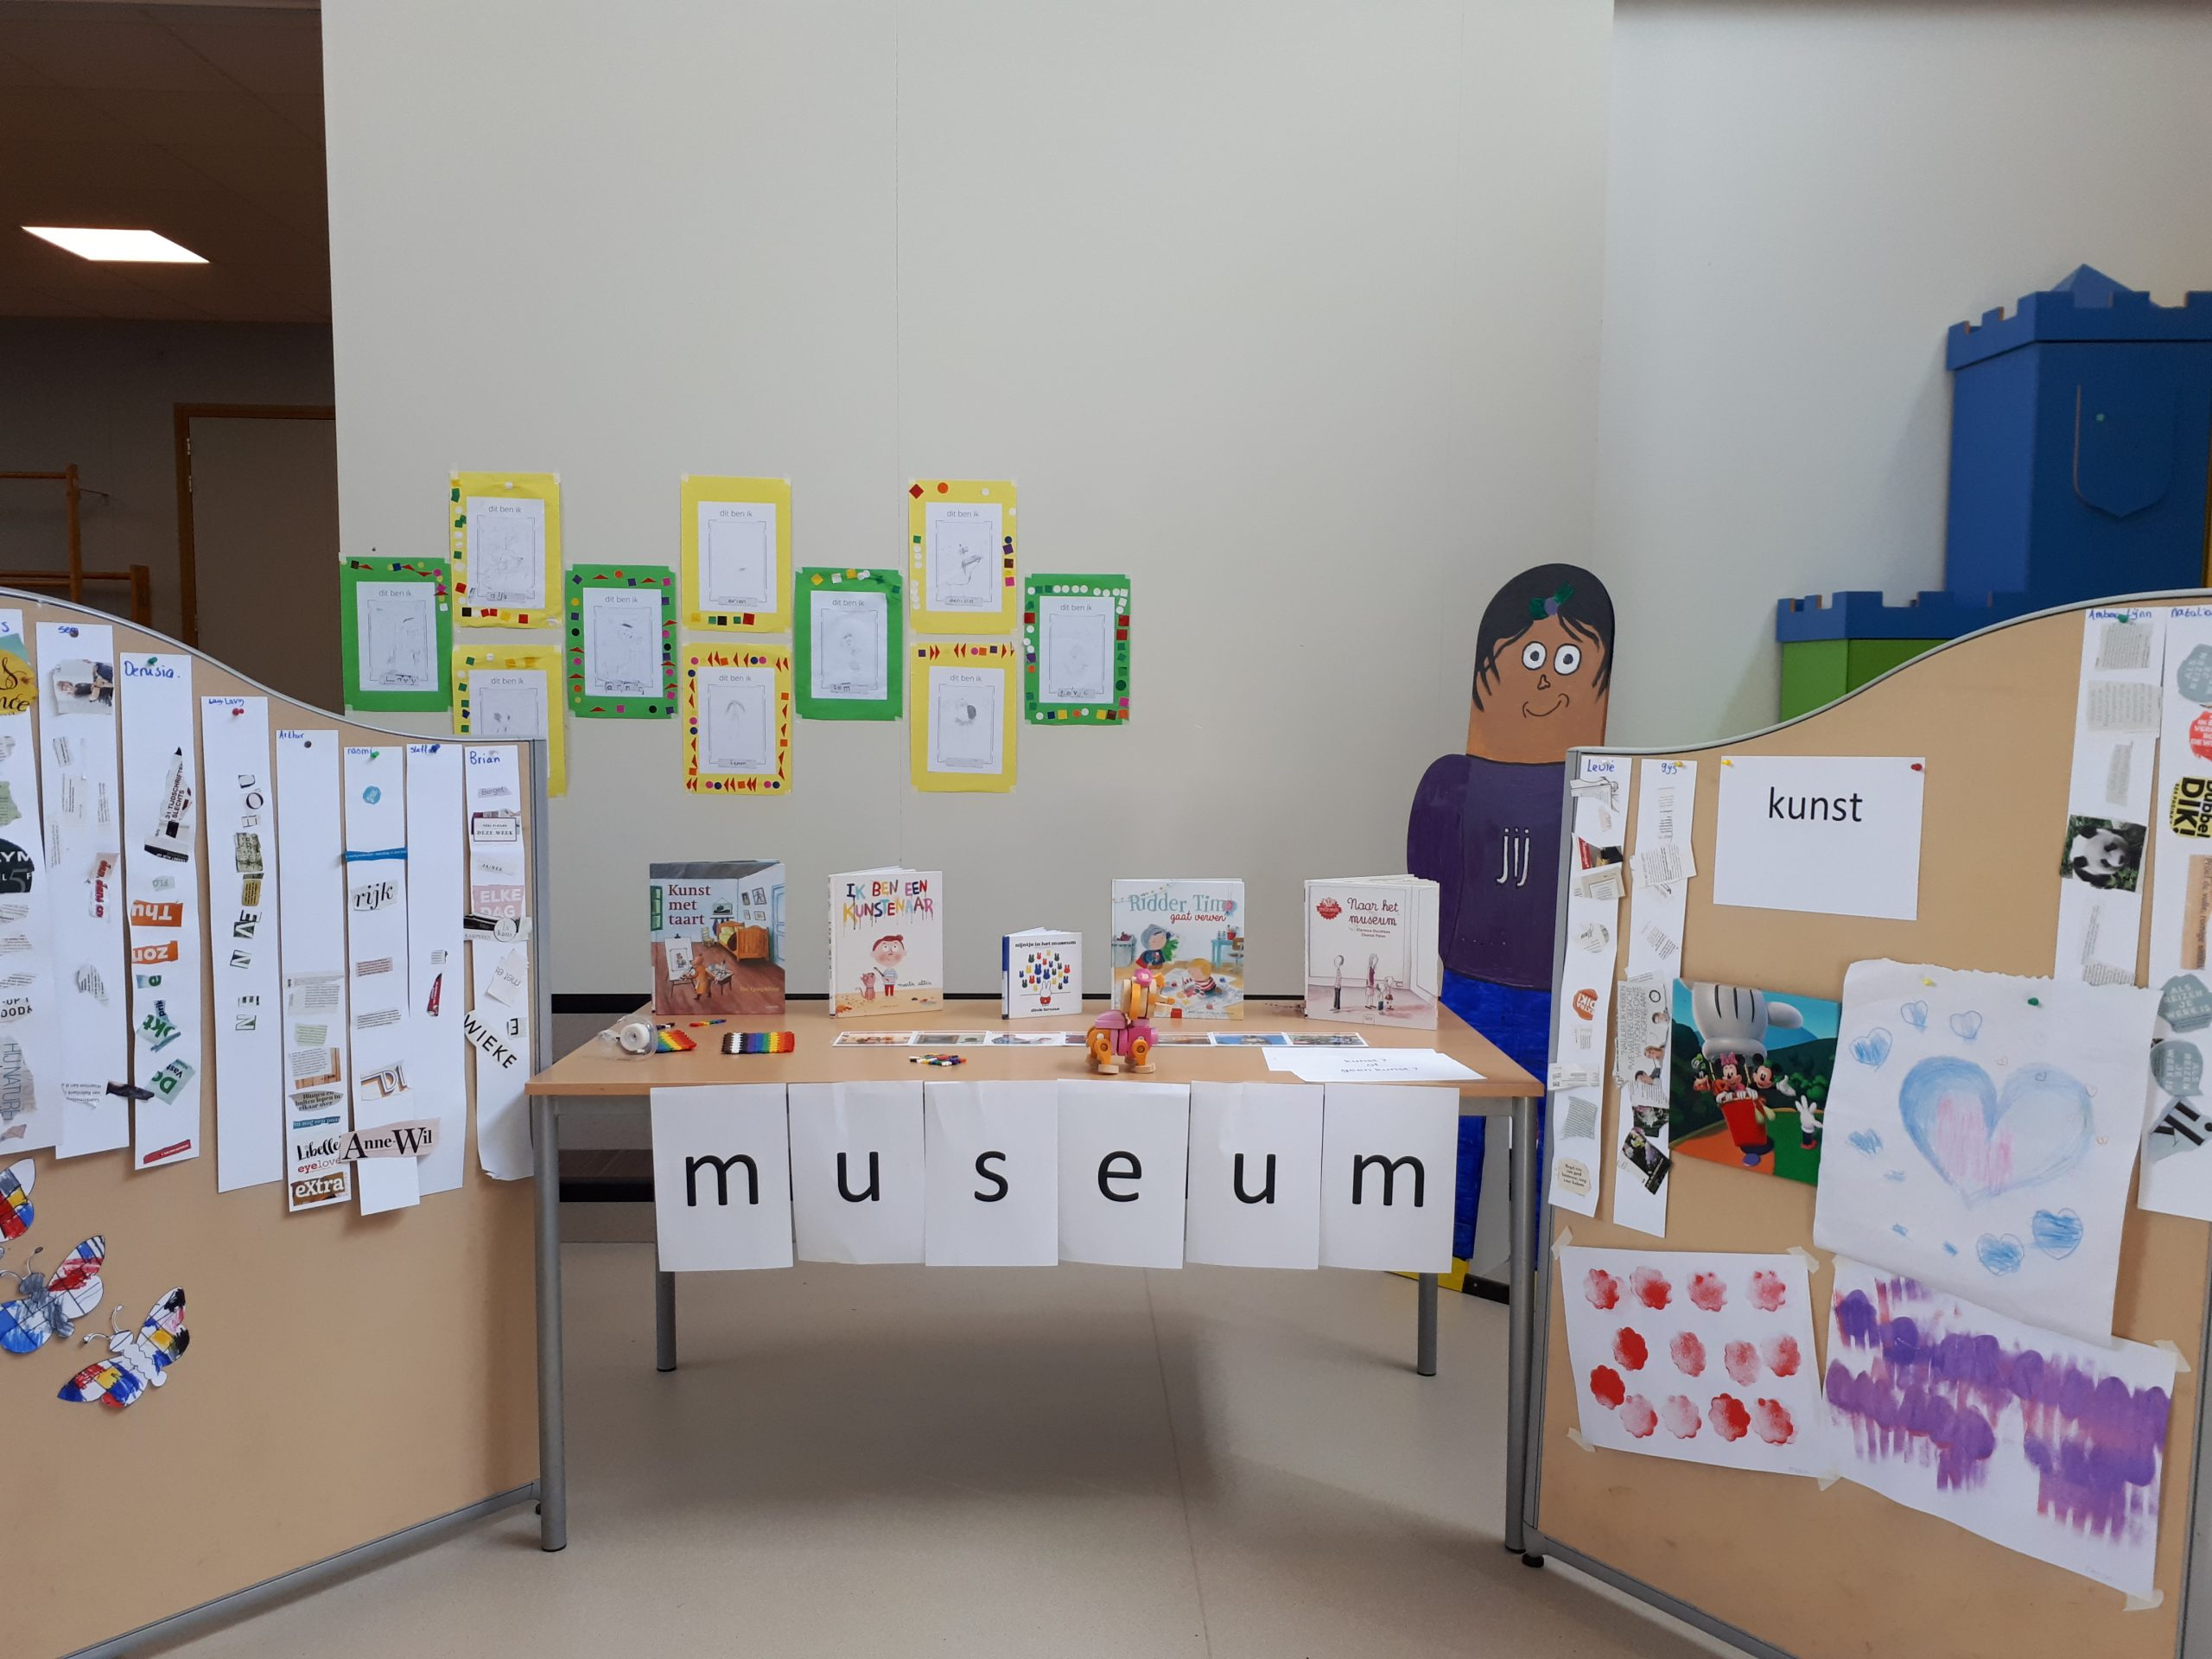 thema Kunst - museum